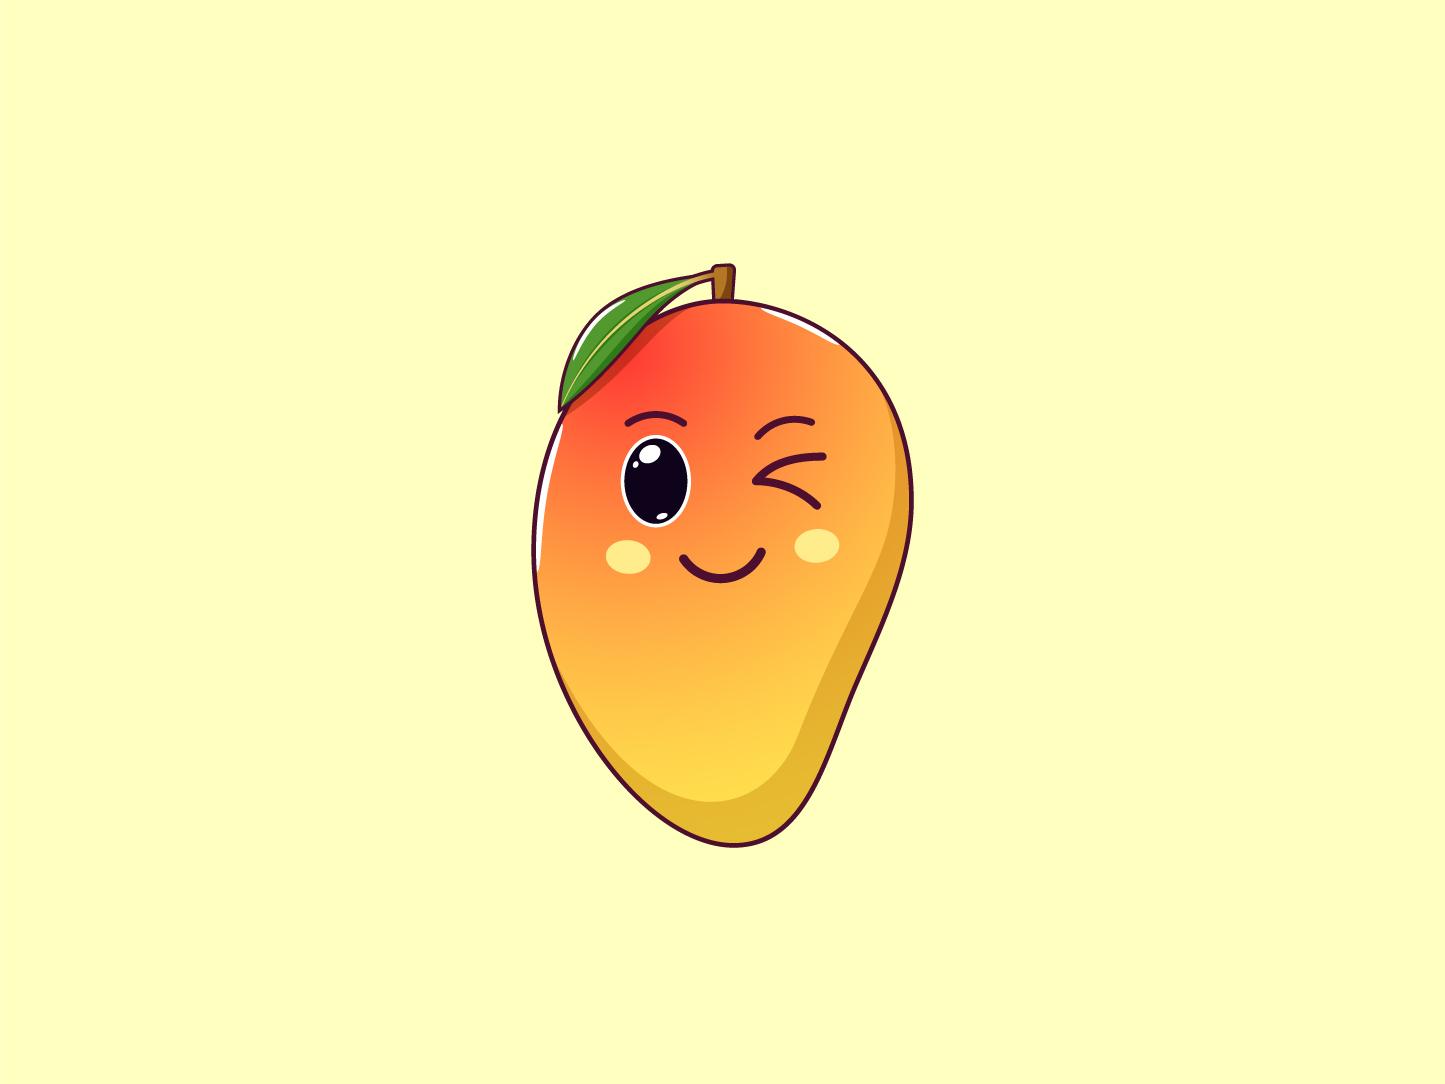 Cute Kawaii Mango, Cartoon Fruit juicy summer face vector tropical sticker smile mango kawaii illustration fruit emoji cute cartoon